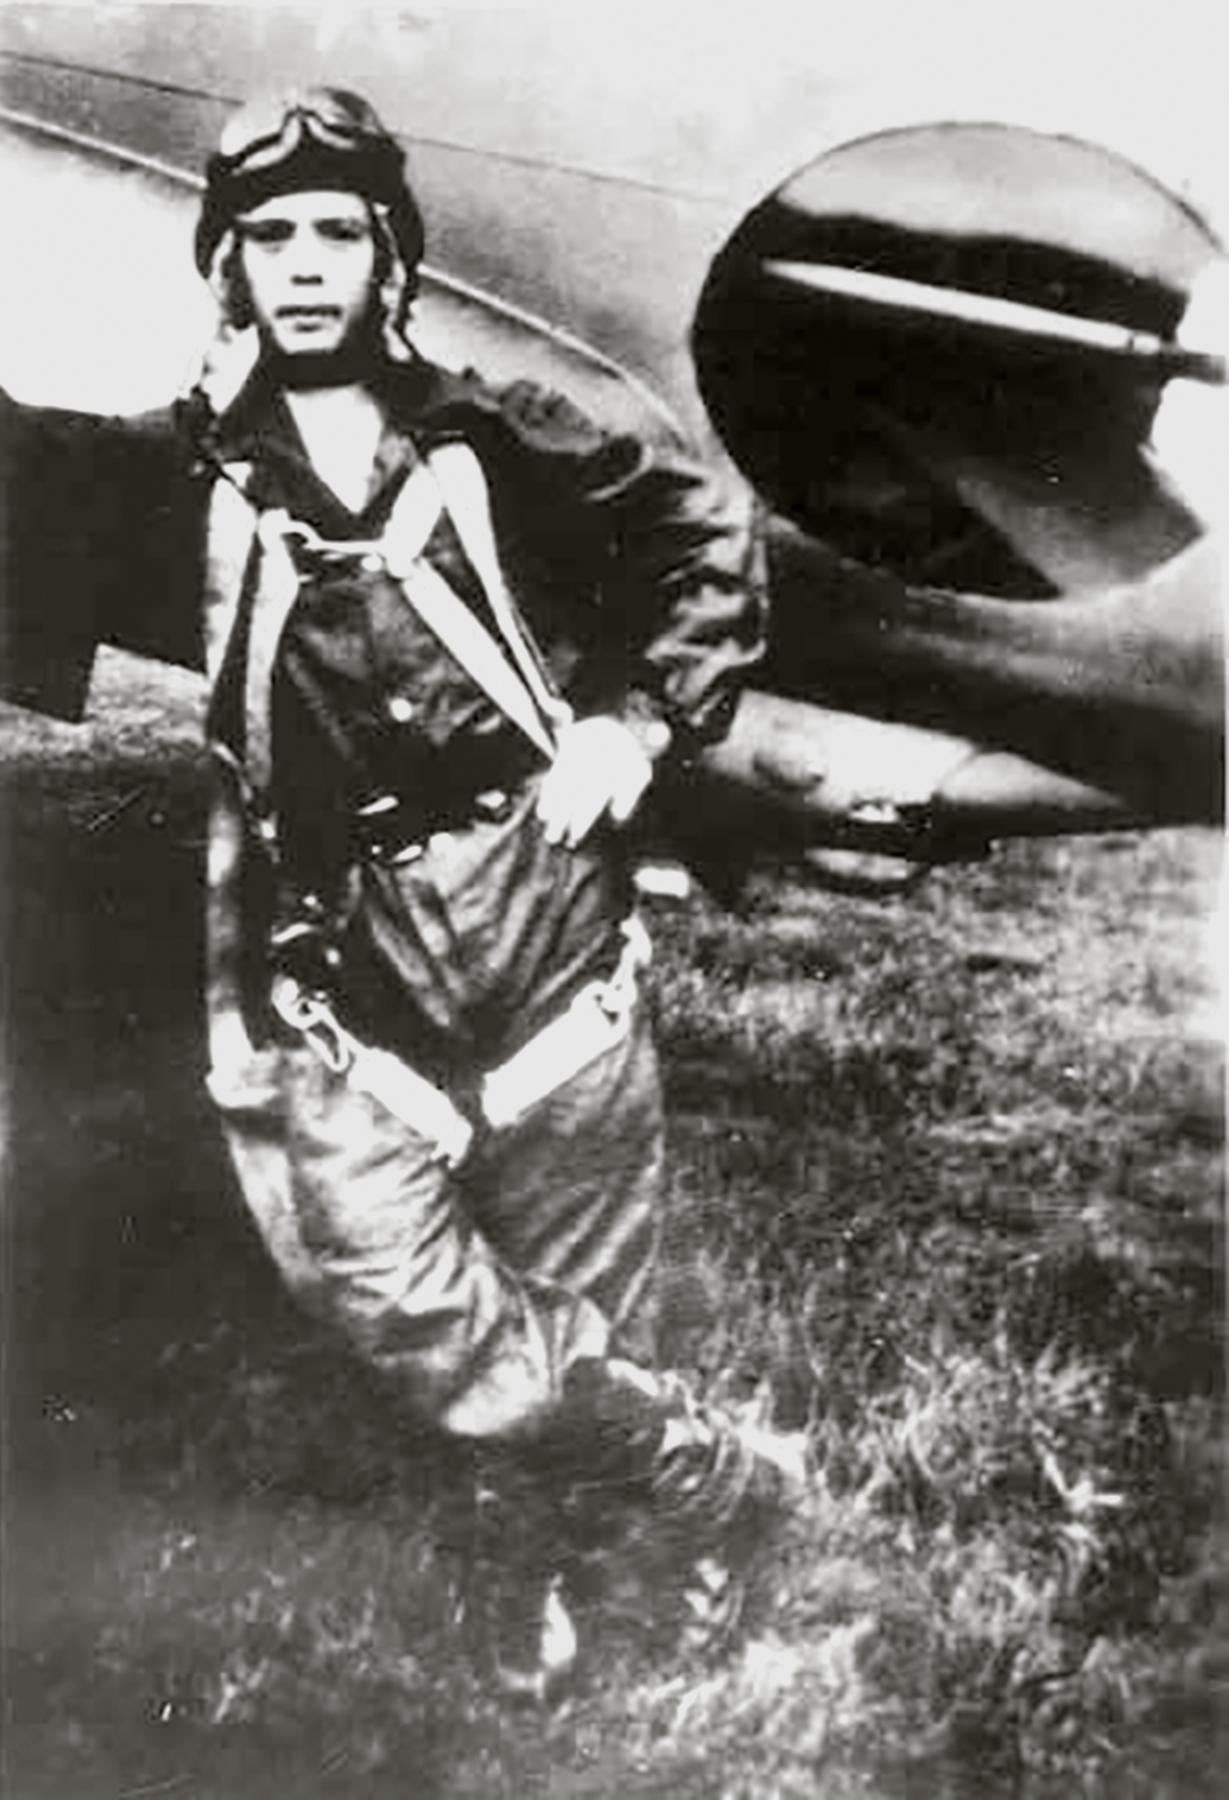 Aircrew Soviet 540BAP with Lt Valko Pavel Ivanovich 01